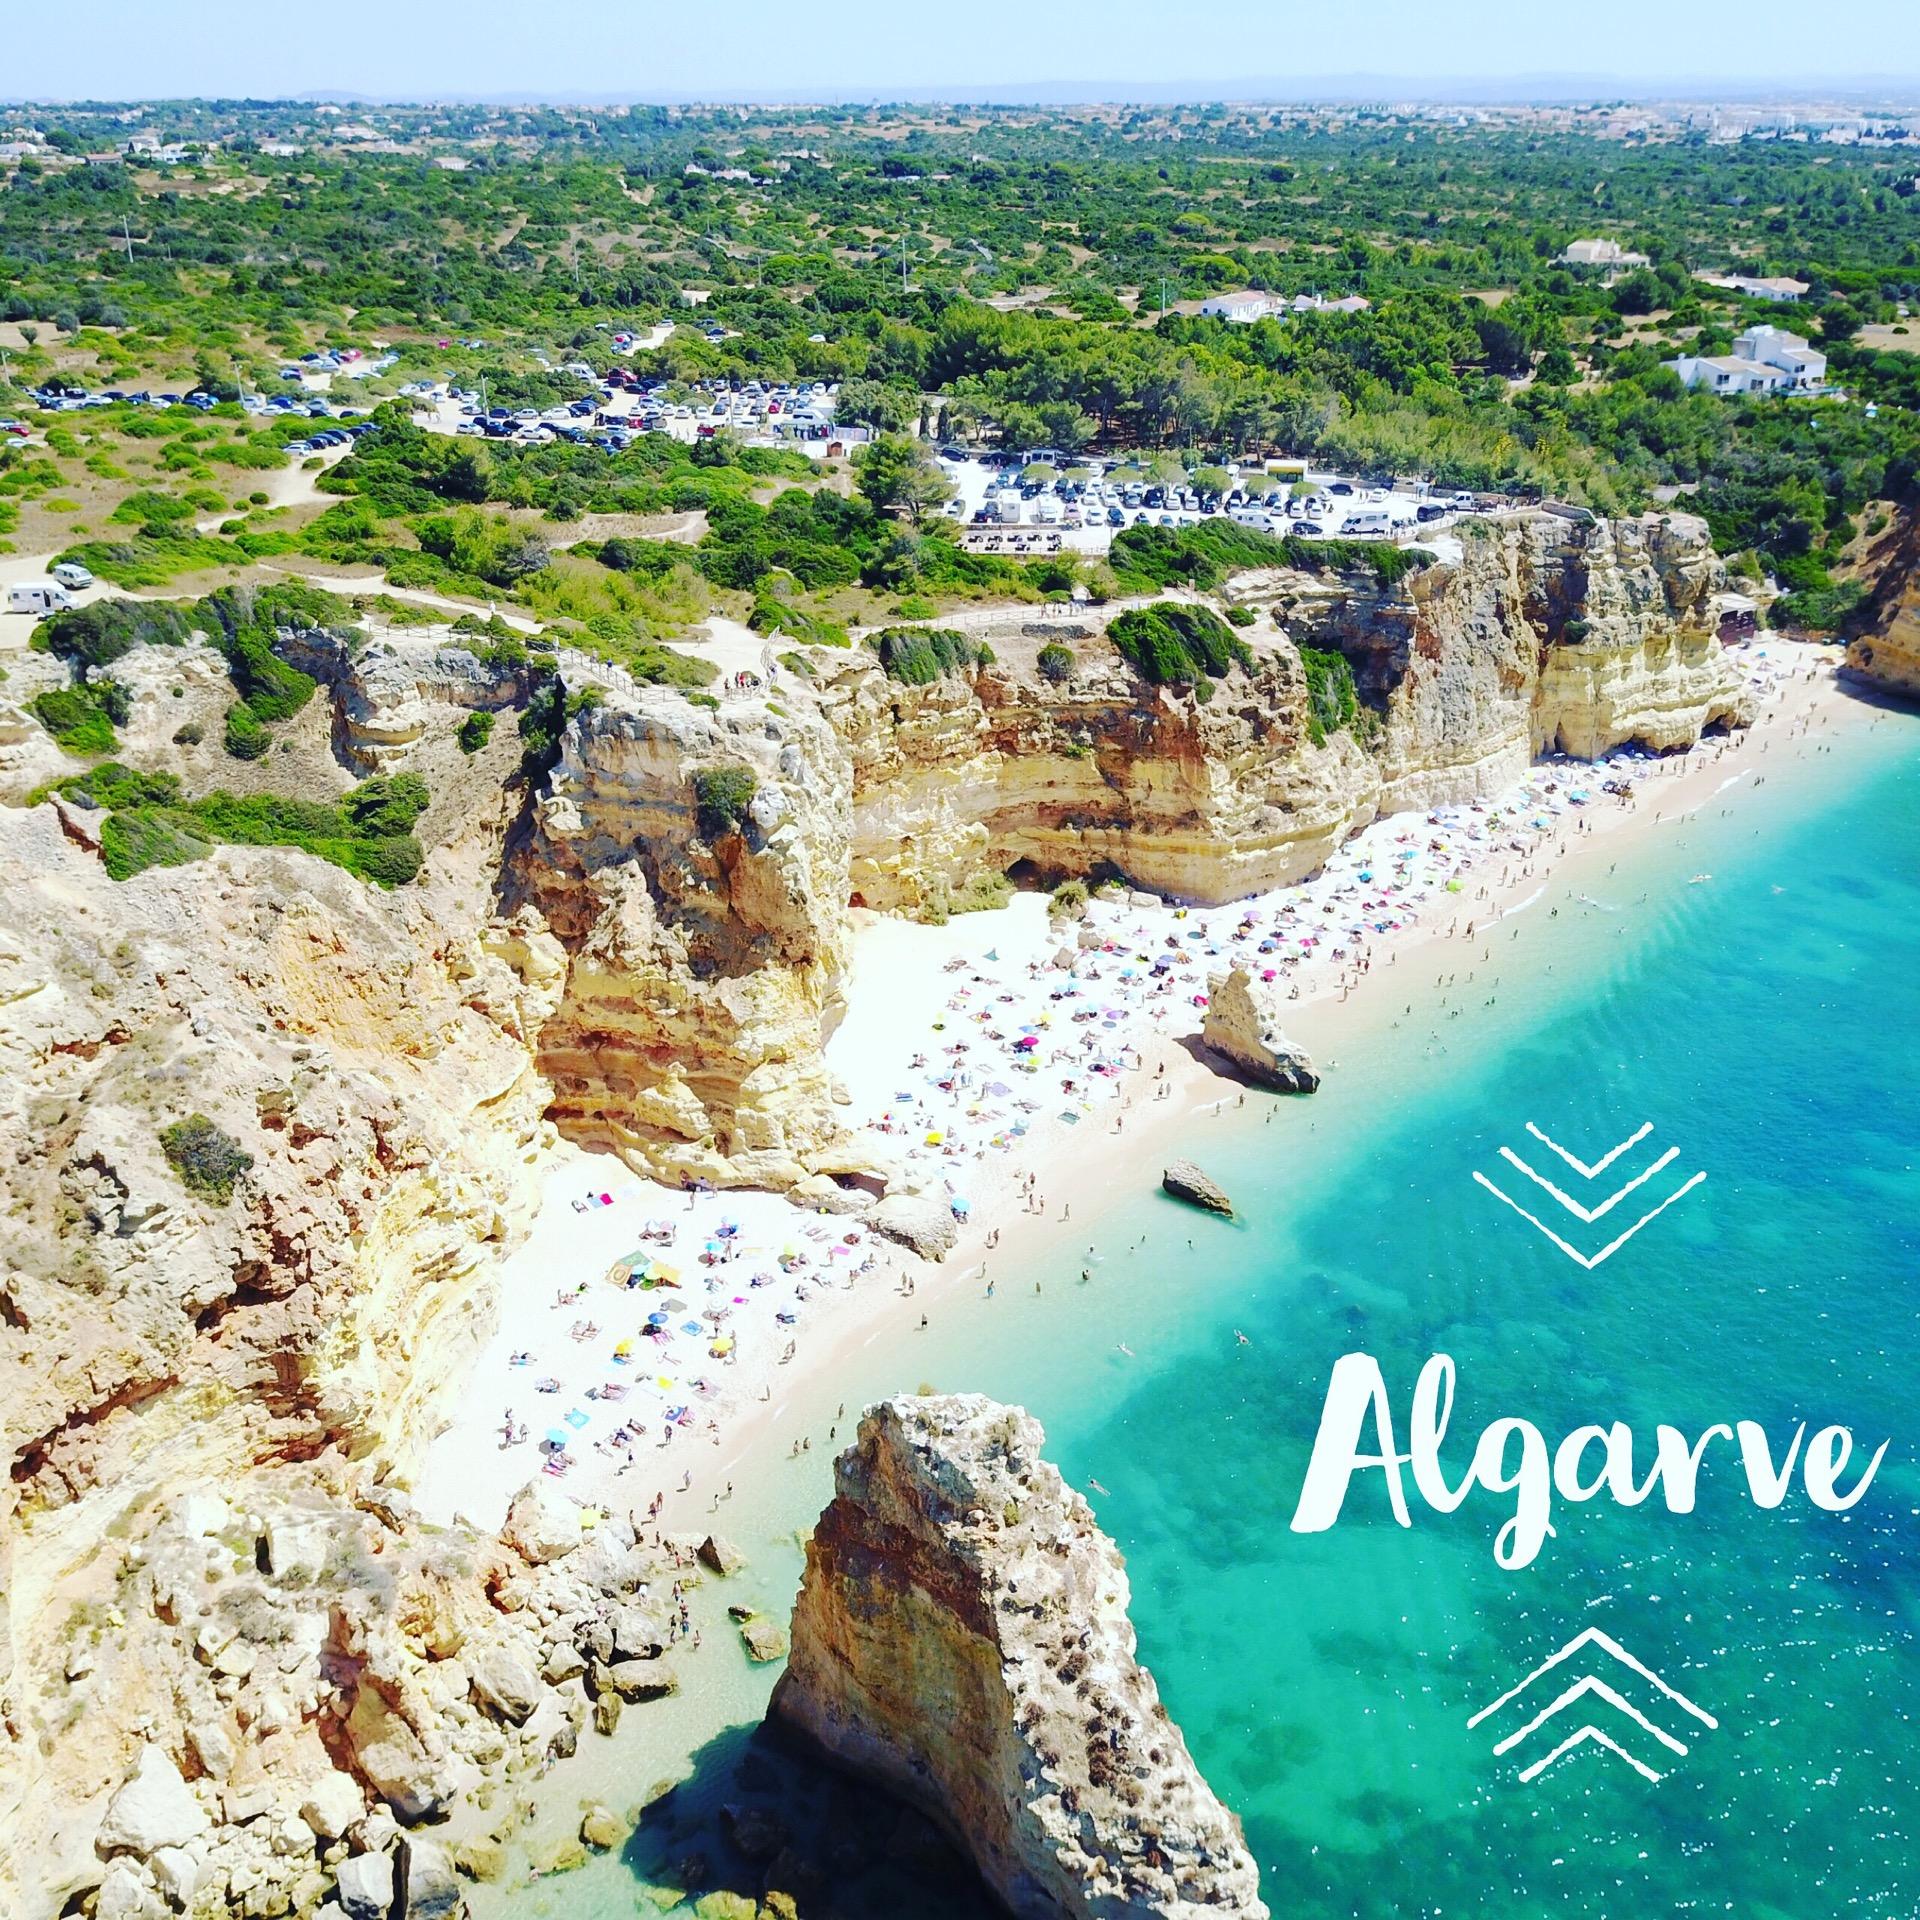 "Beach at Praia Marina Algarve Portugal with stylized text ""Algarve"" overlaid"